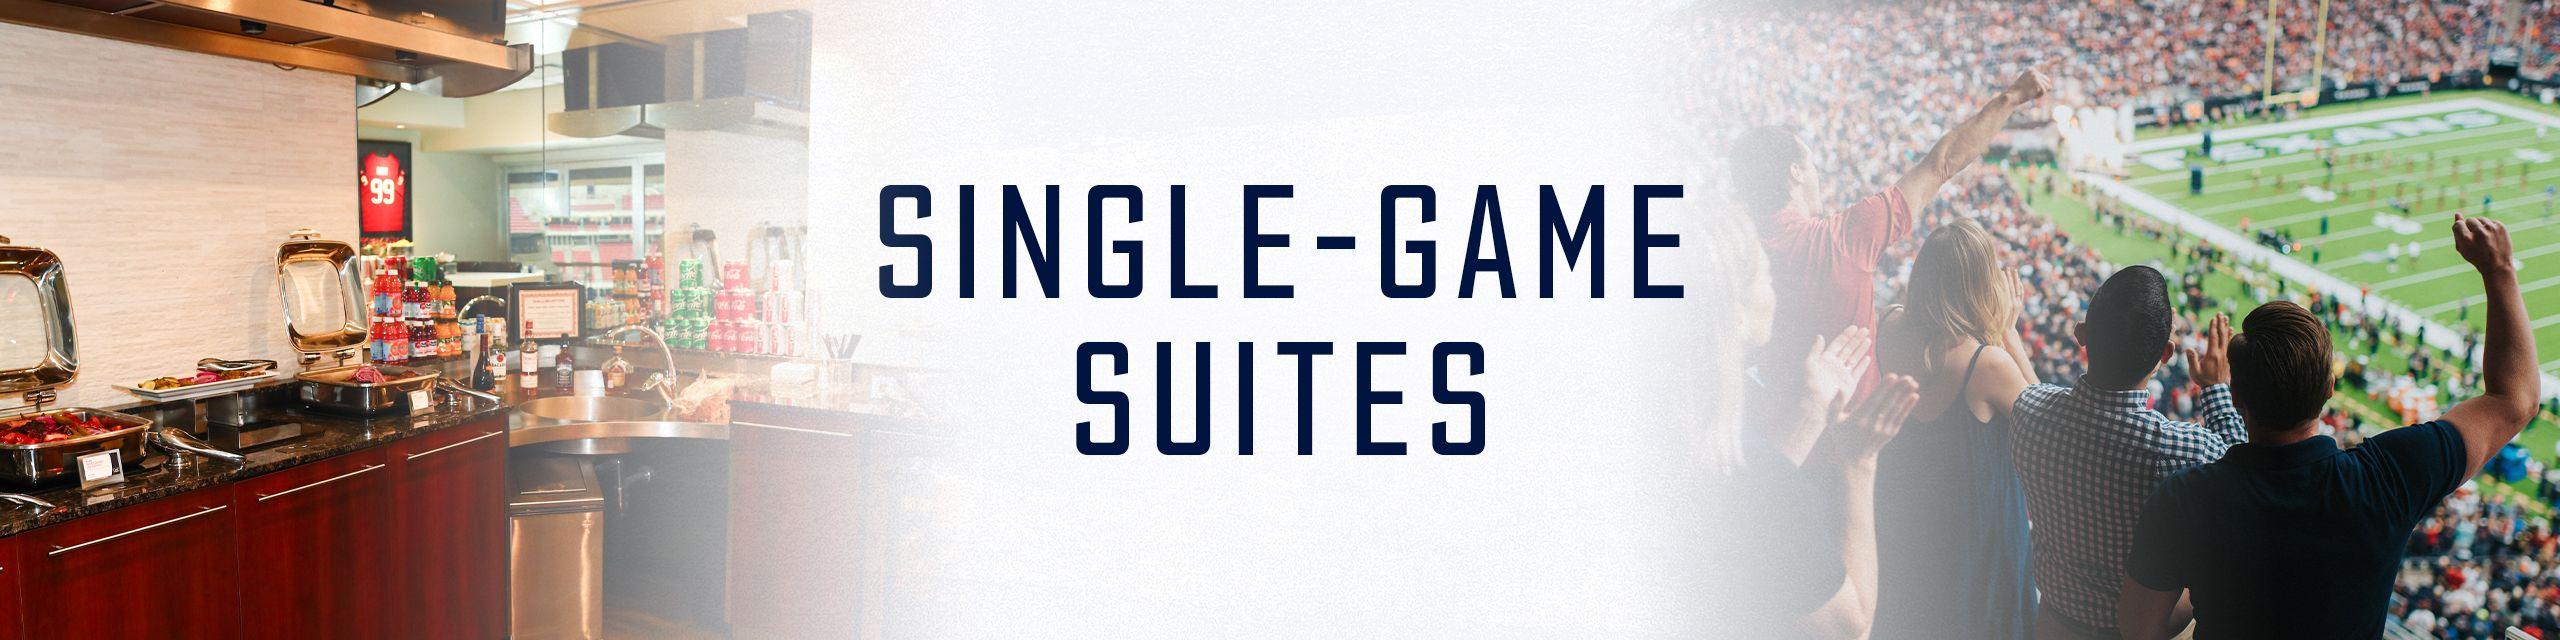 Single-Game Suites